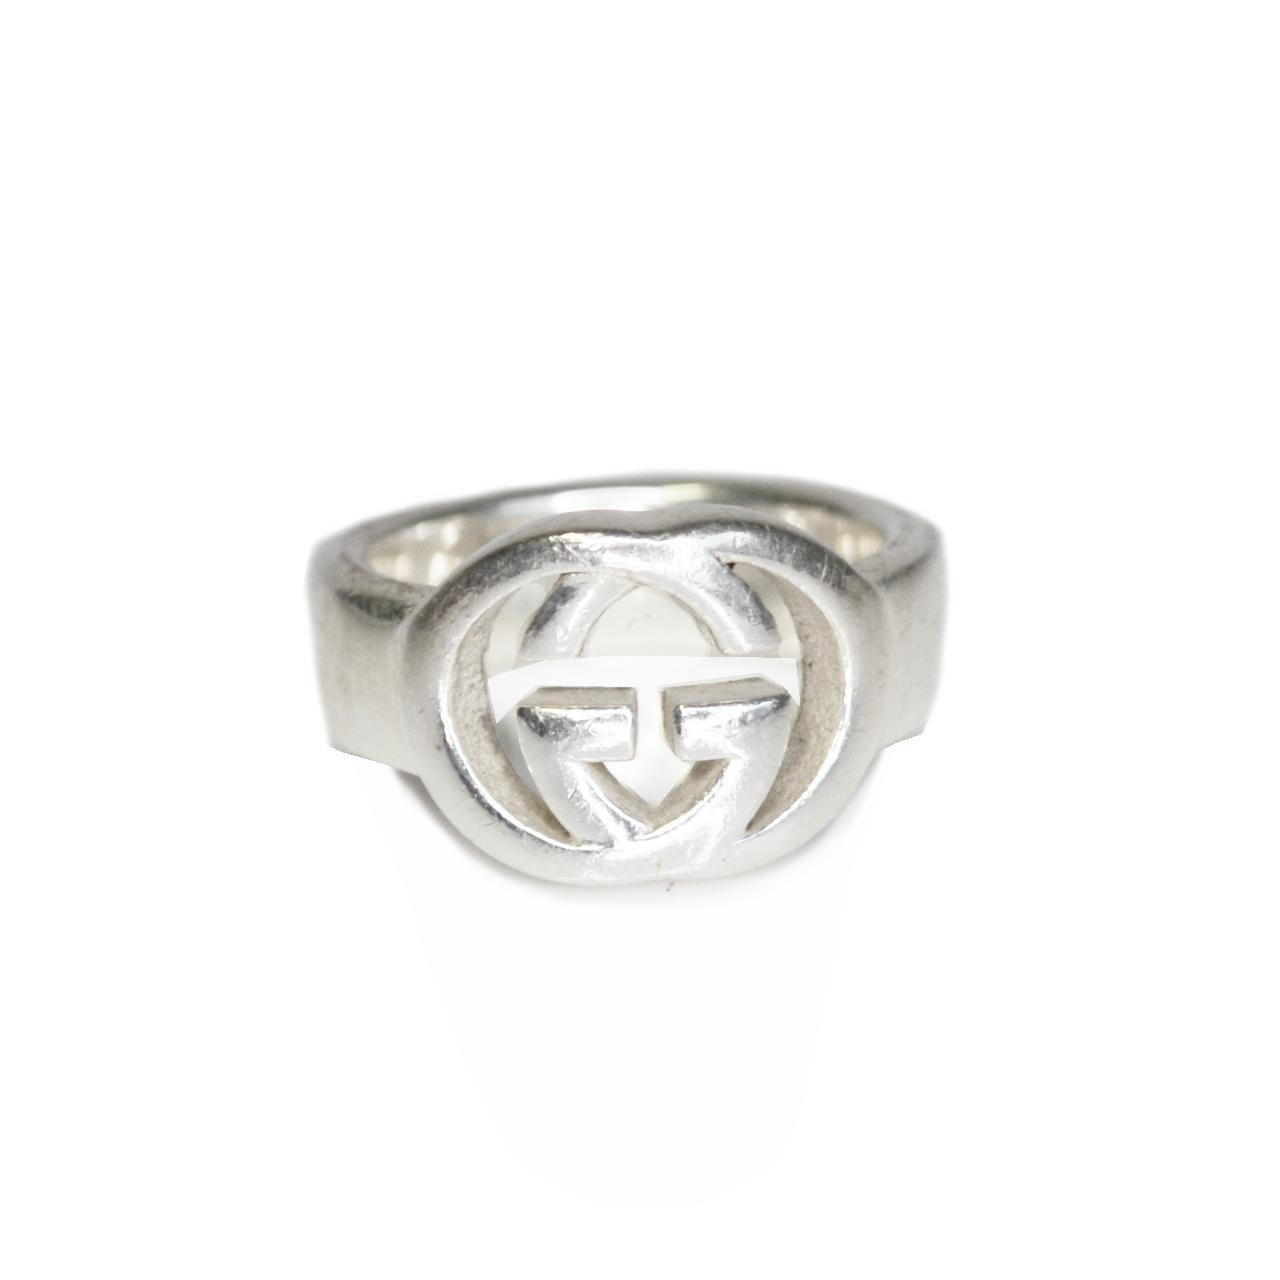 Vintage Gucci GG Logo Signet Ring in Solid Silver | NITRYL